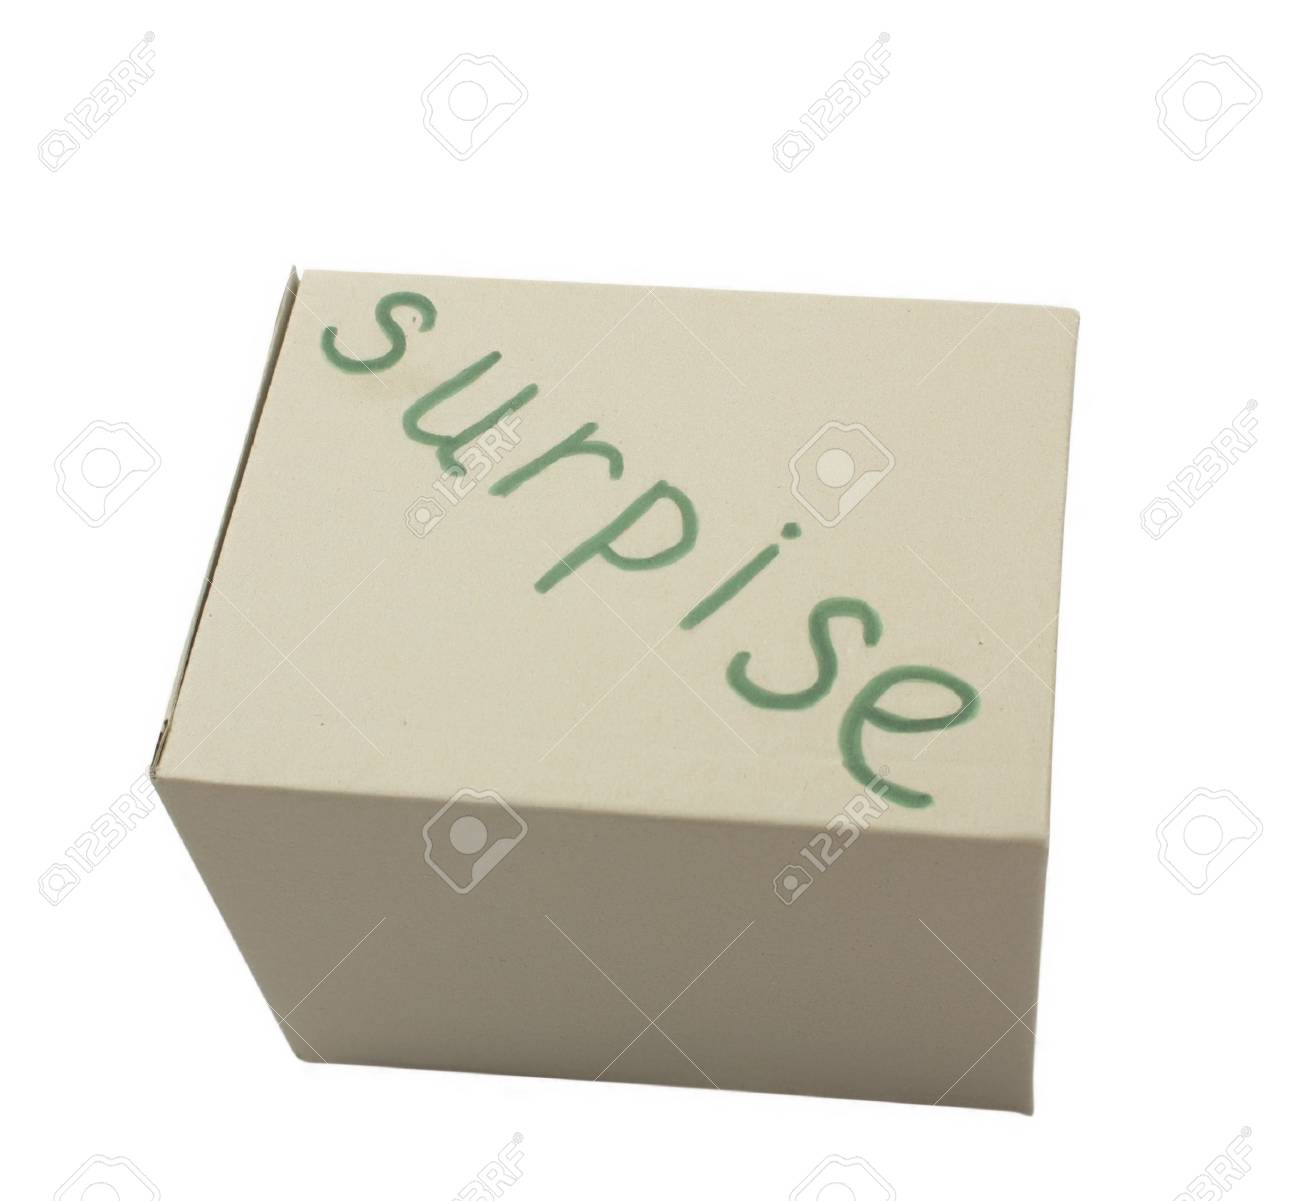 Cardboard box isolated over white background Stock Photo - 6690749